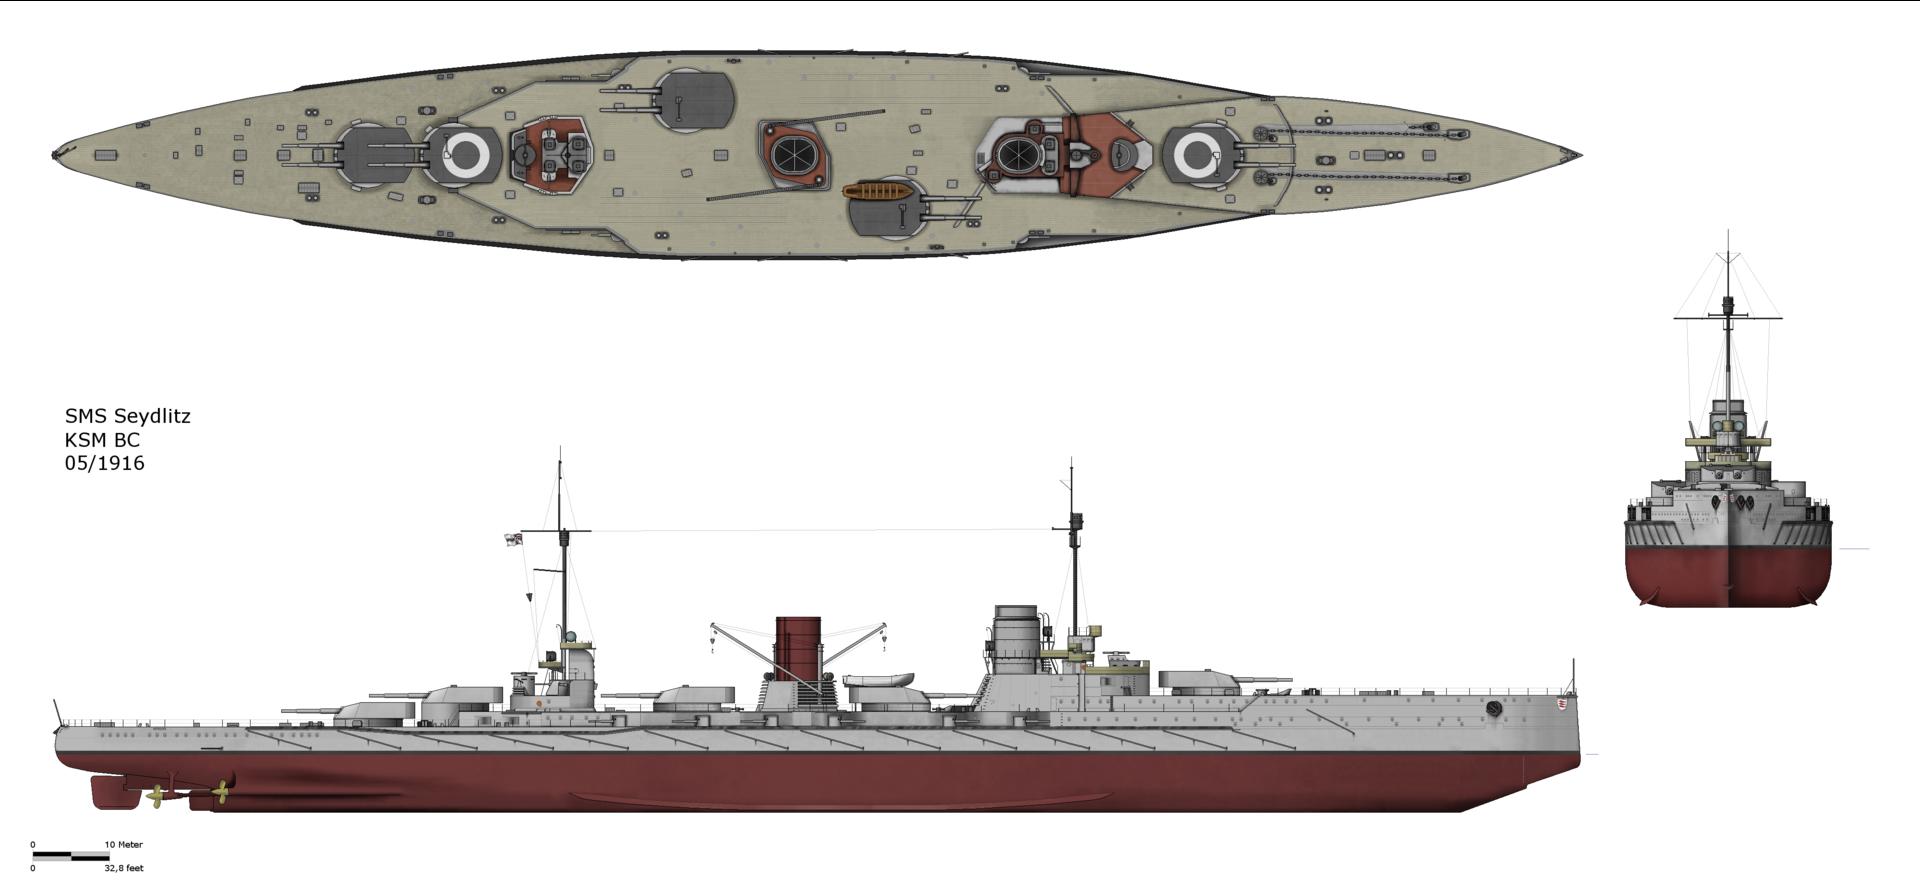 1920px-Seydlitz1916.png